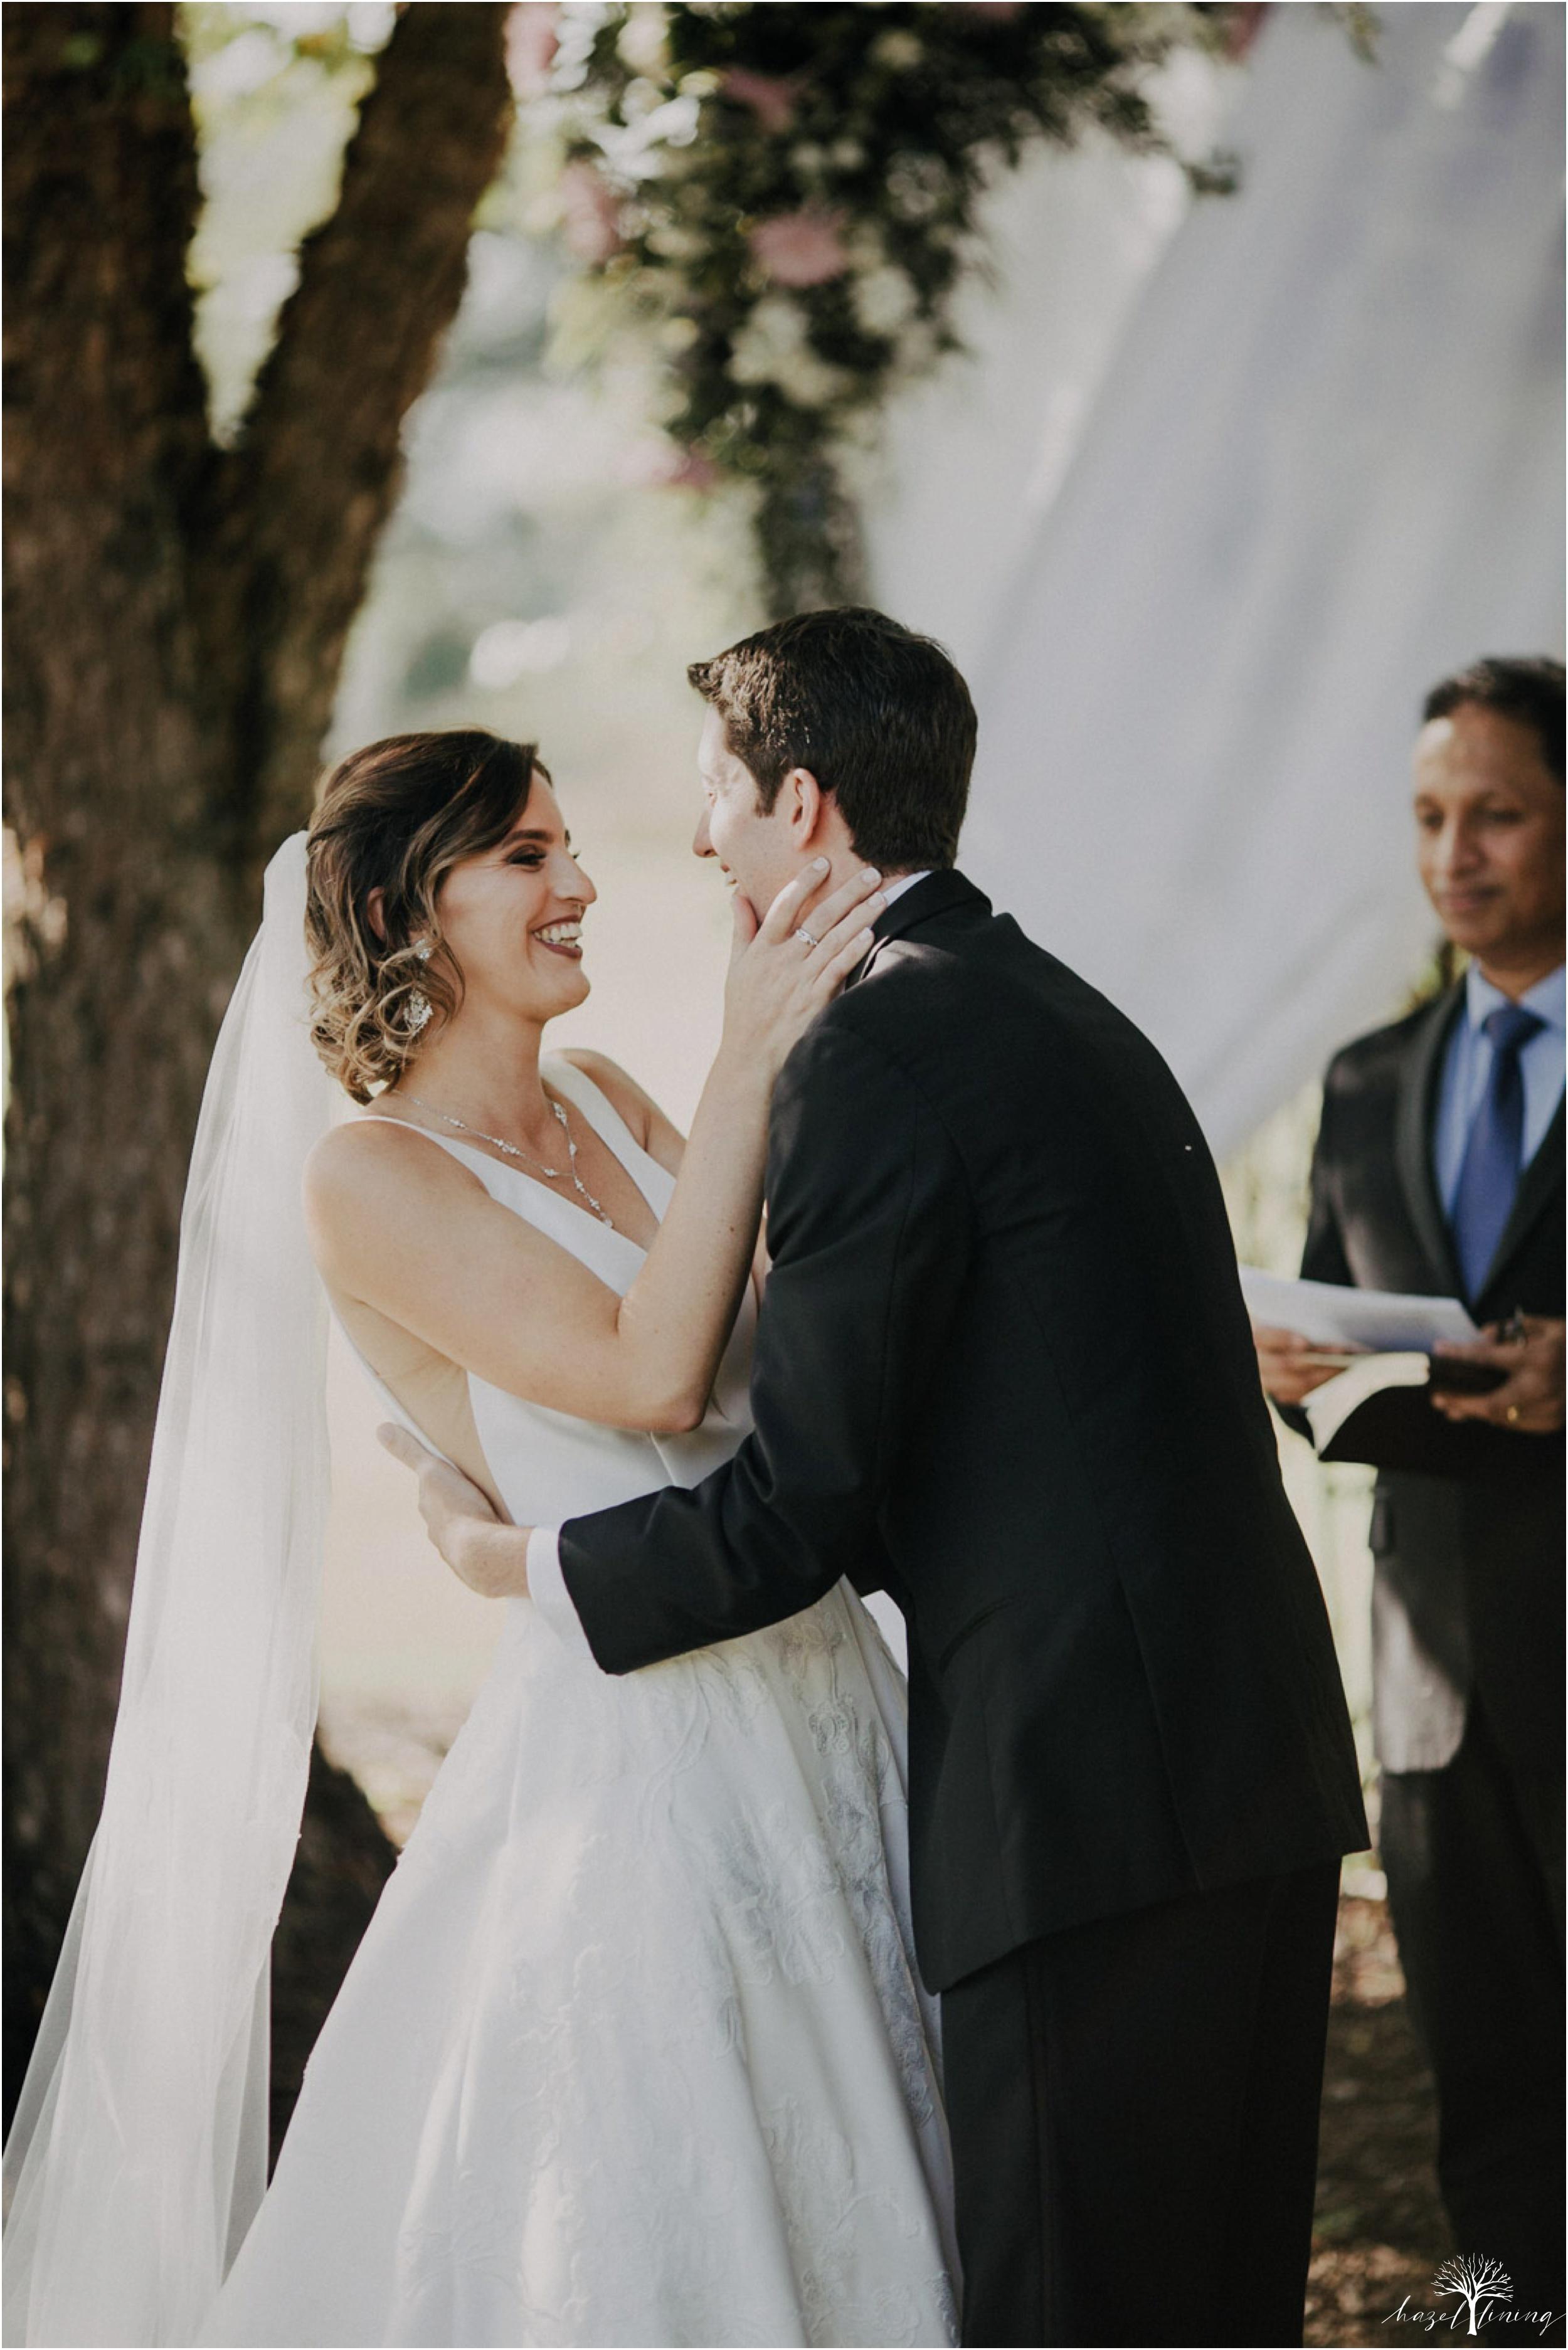 maureen-hepner-anthony-giordano-rose-bank-winery-newtow-pennsylvania-luxury-summer-wedding-hazel-lining-photography-destination-elopement-wedding-engagement-photography_0075.jpg